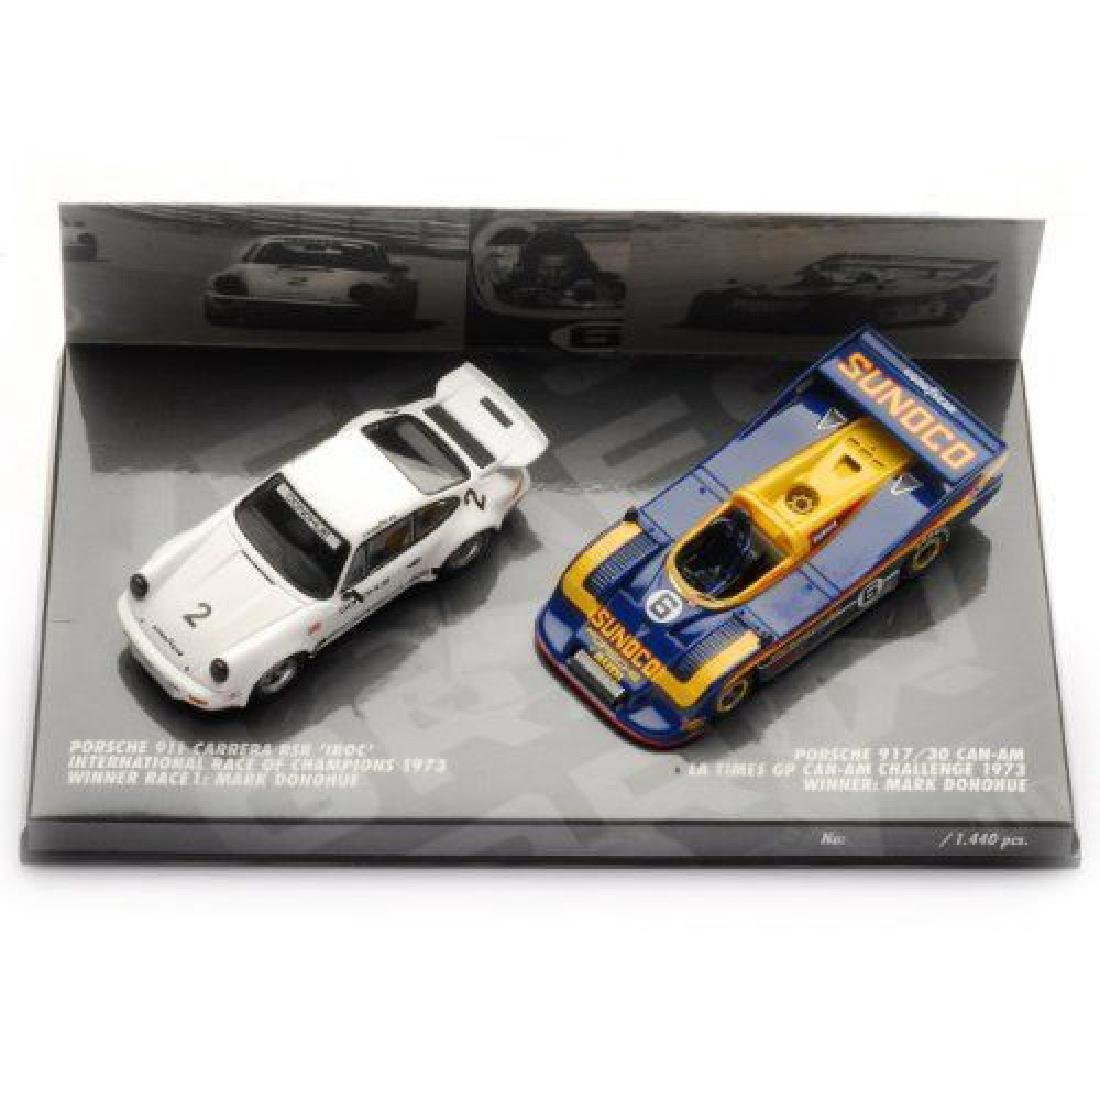 Minichamps Scale 1:43 Porsche 911 917 Mark Donohue 1973 - 2